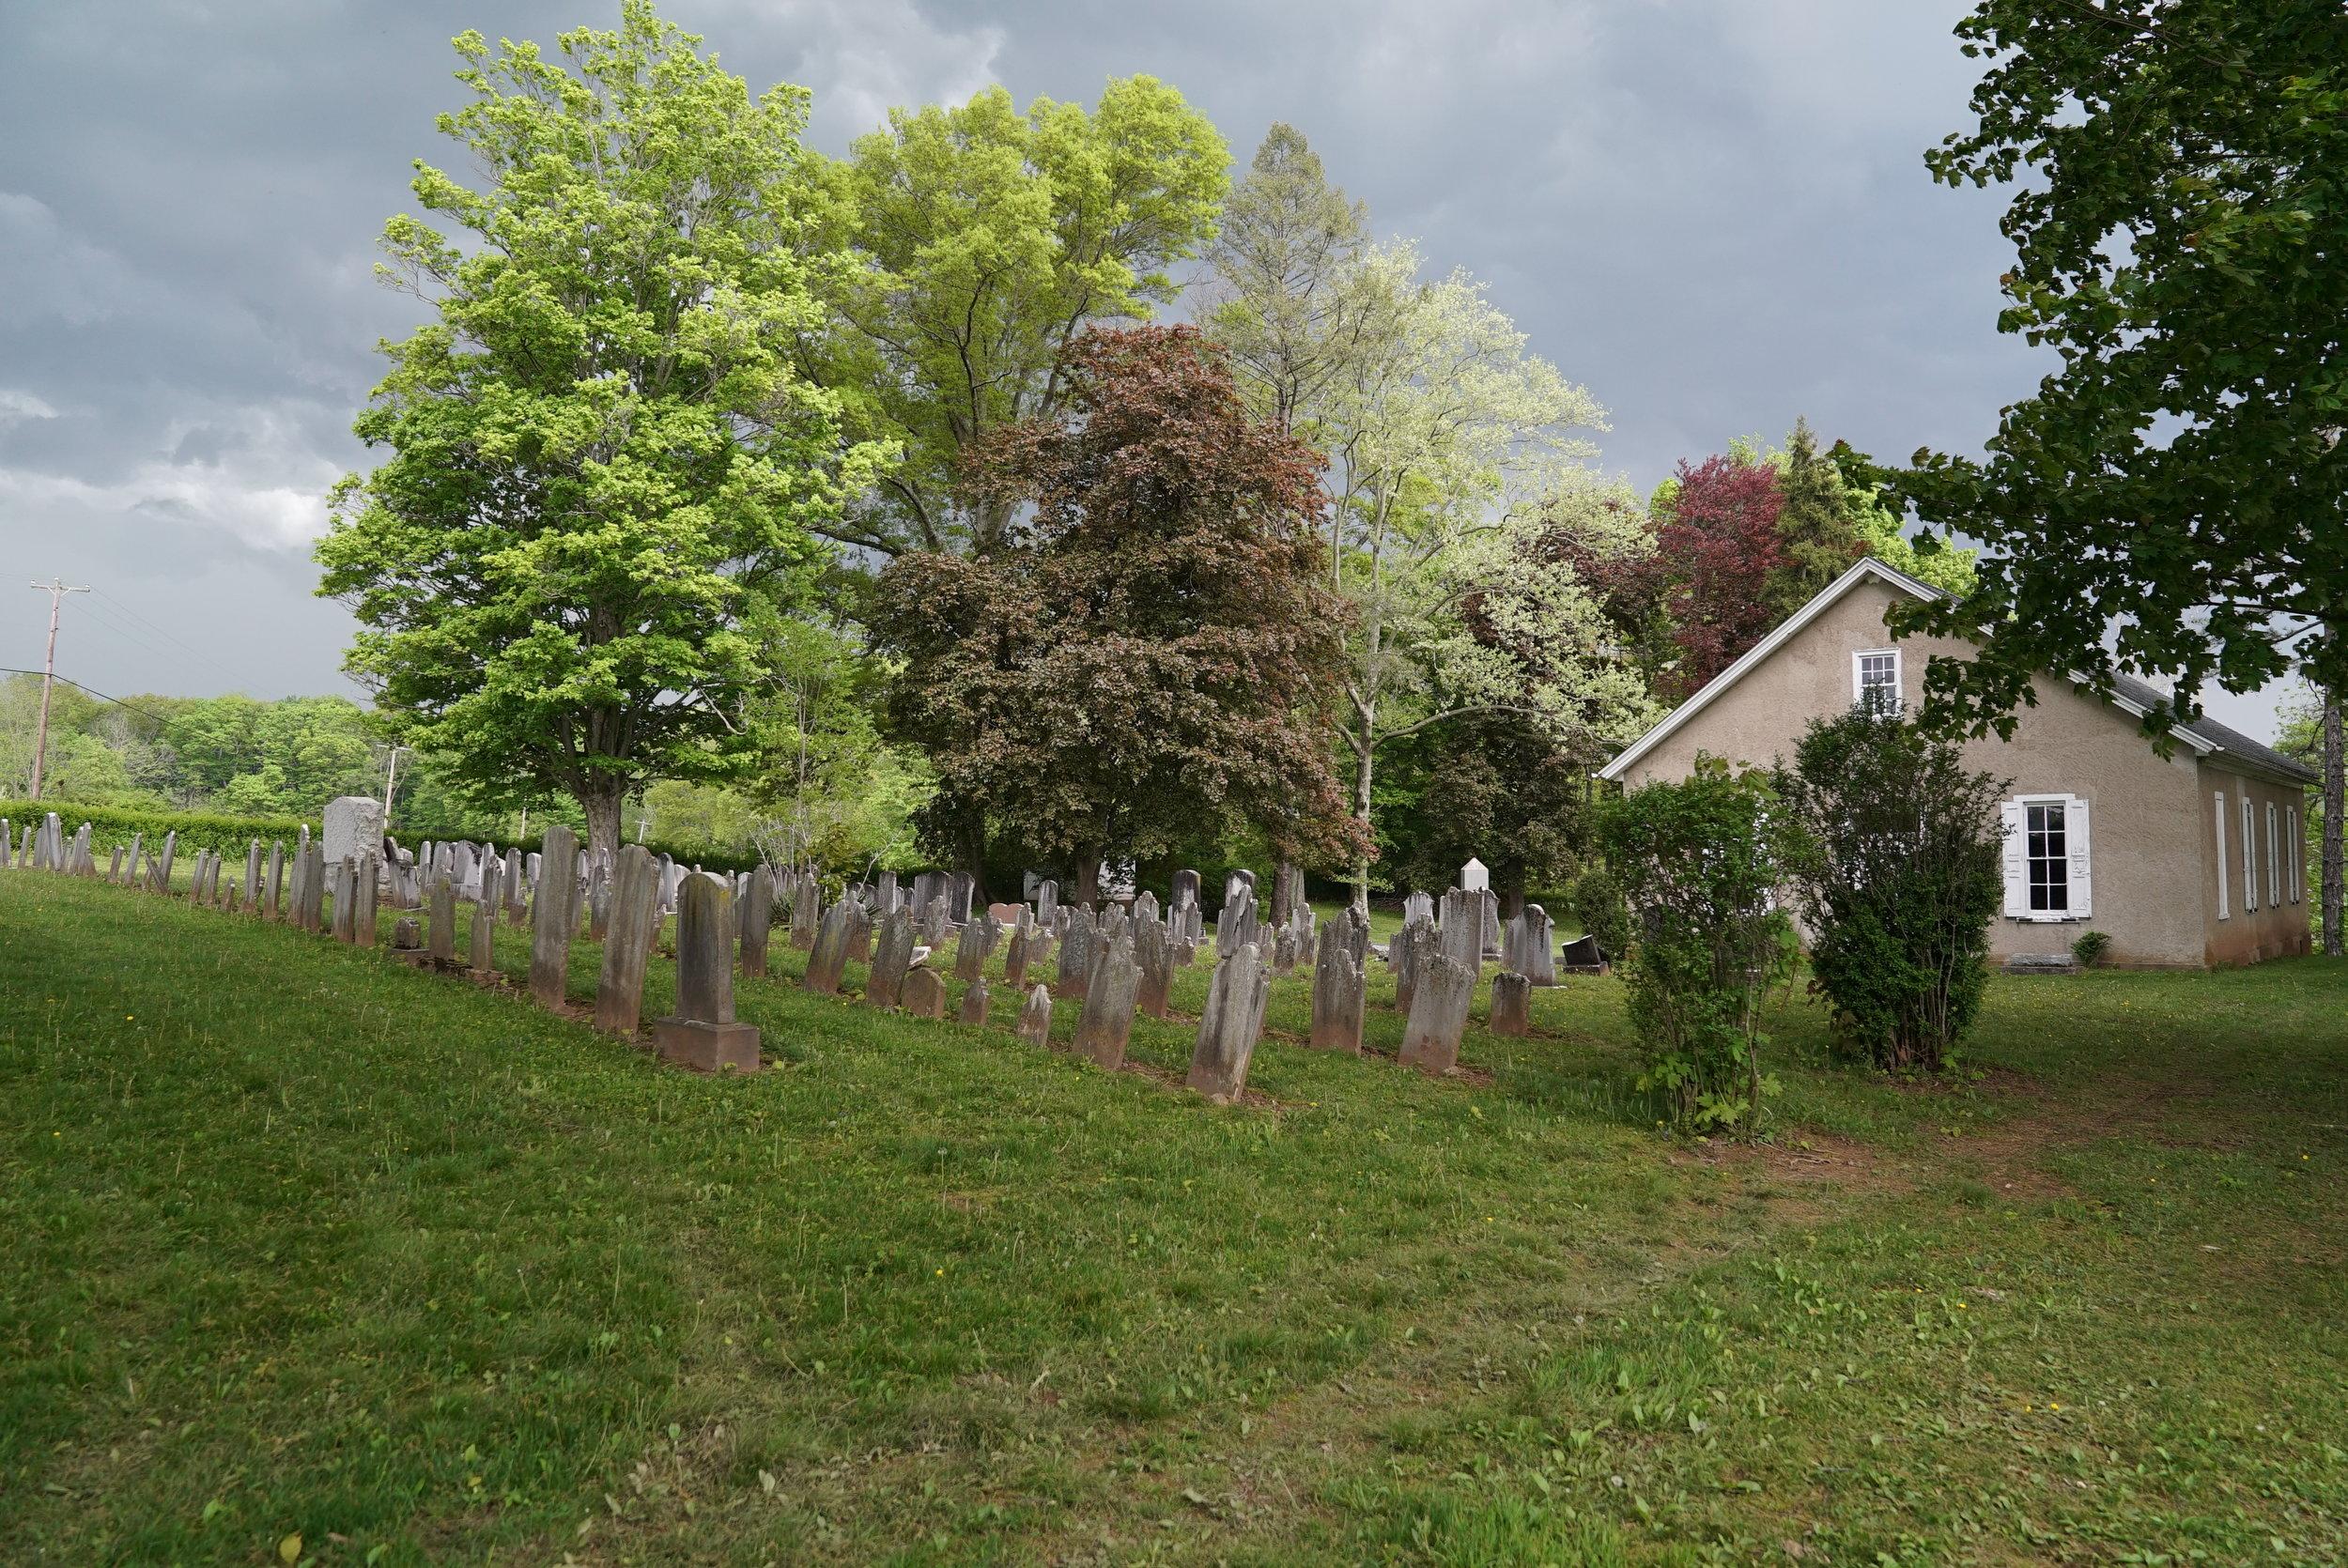 Hosensack Meeting House and Cemetery. Upper Hanover Township, Pennsylvania.